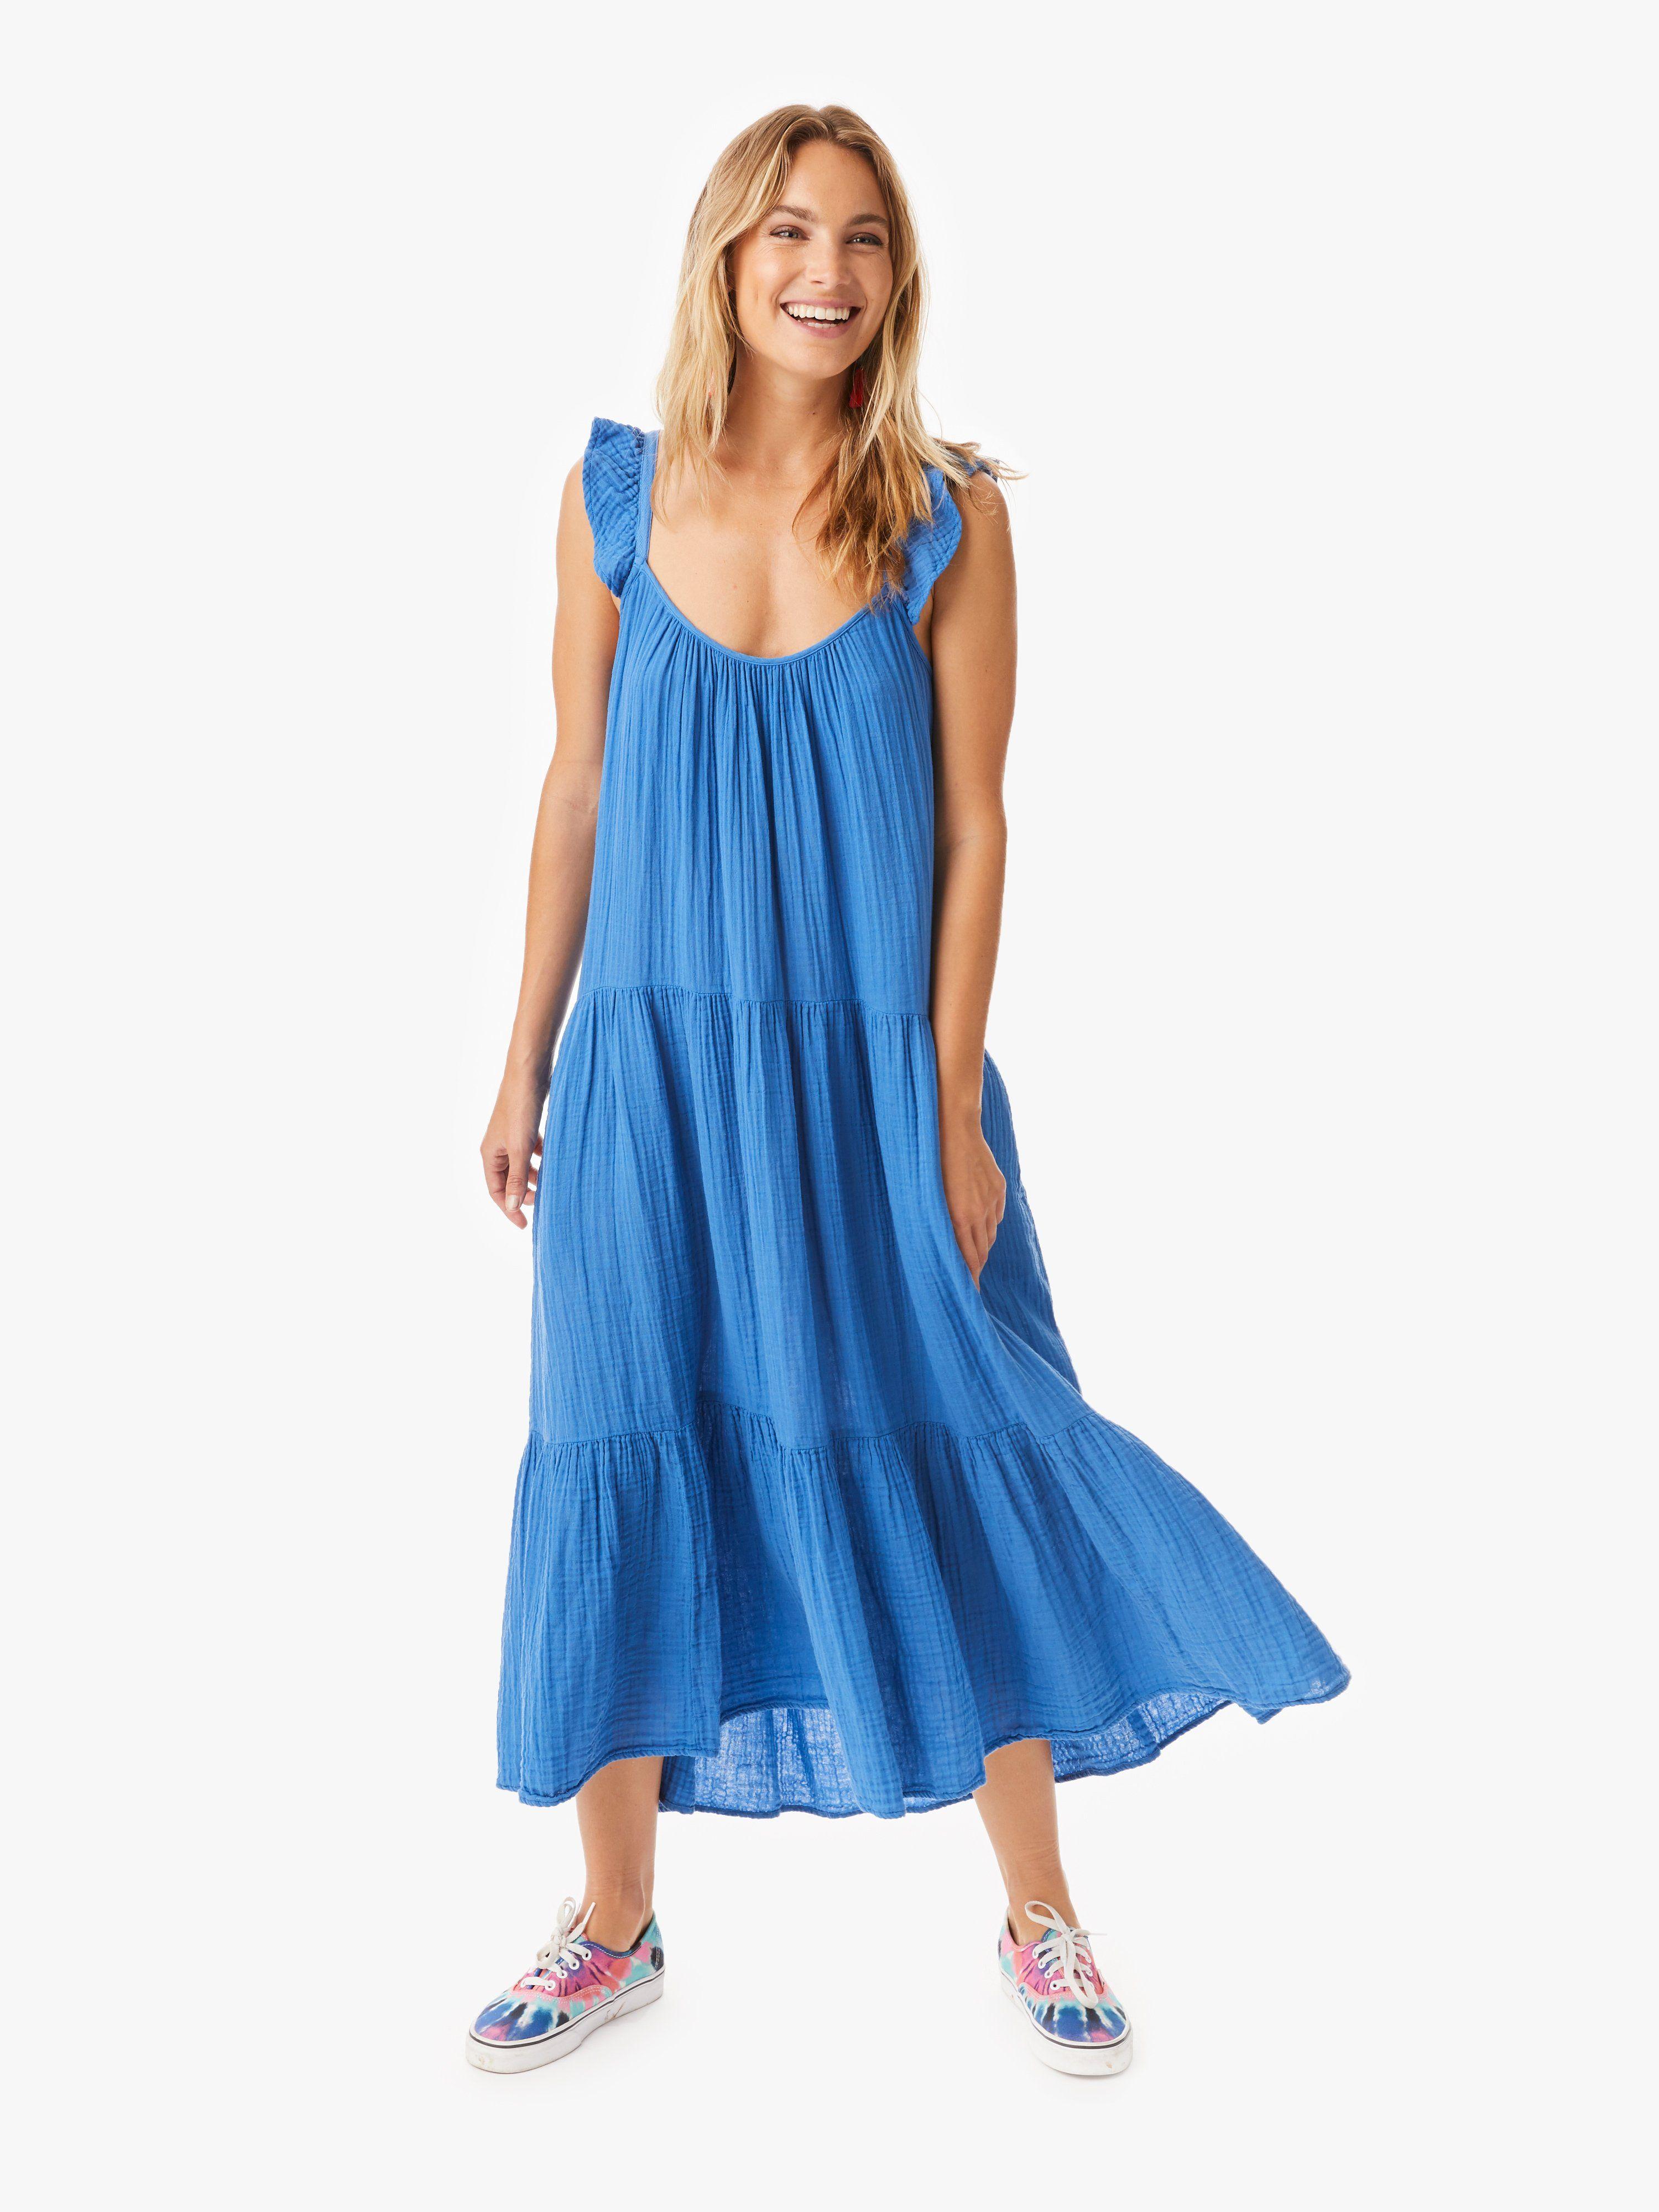 Dusty Pink Rumer Dress Cotton Gauze Dress Gauze Dress Dresses [ 4000 x 3000 Pixel ]